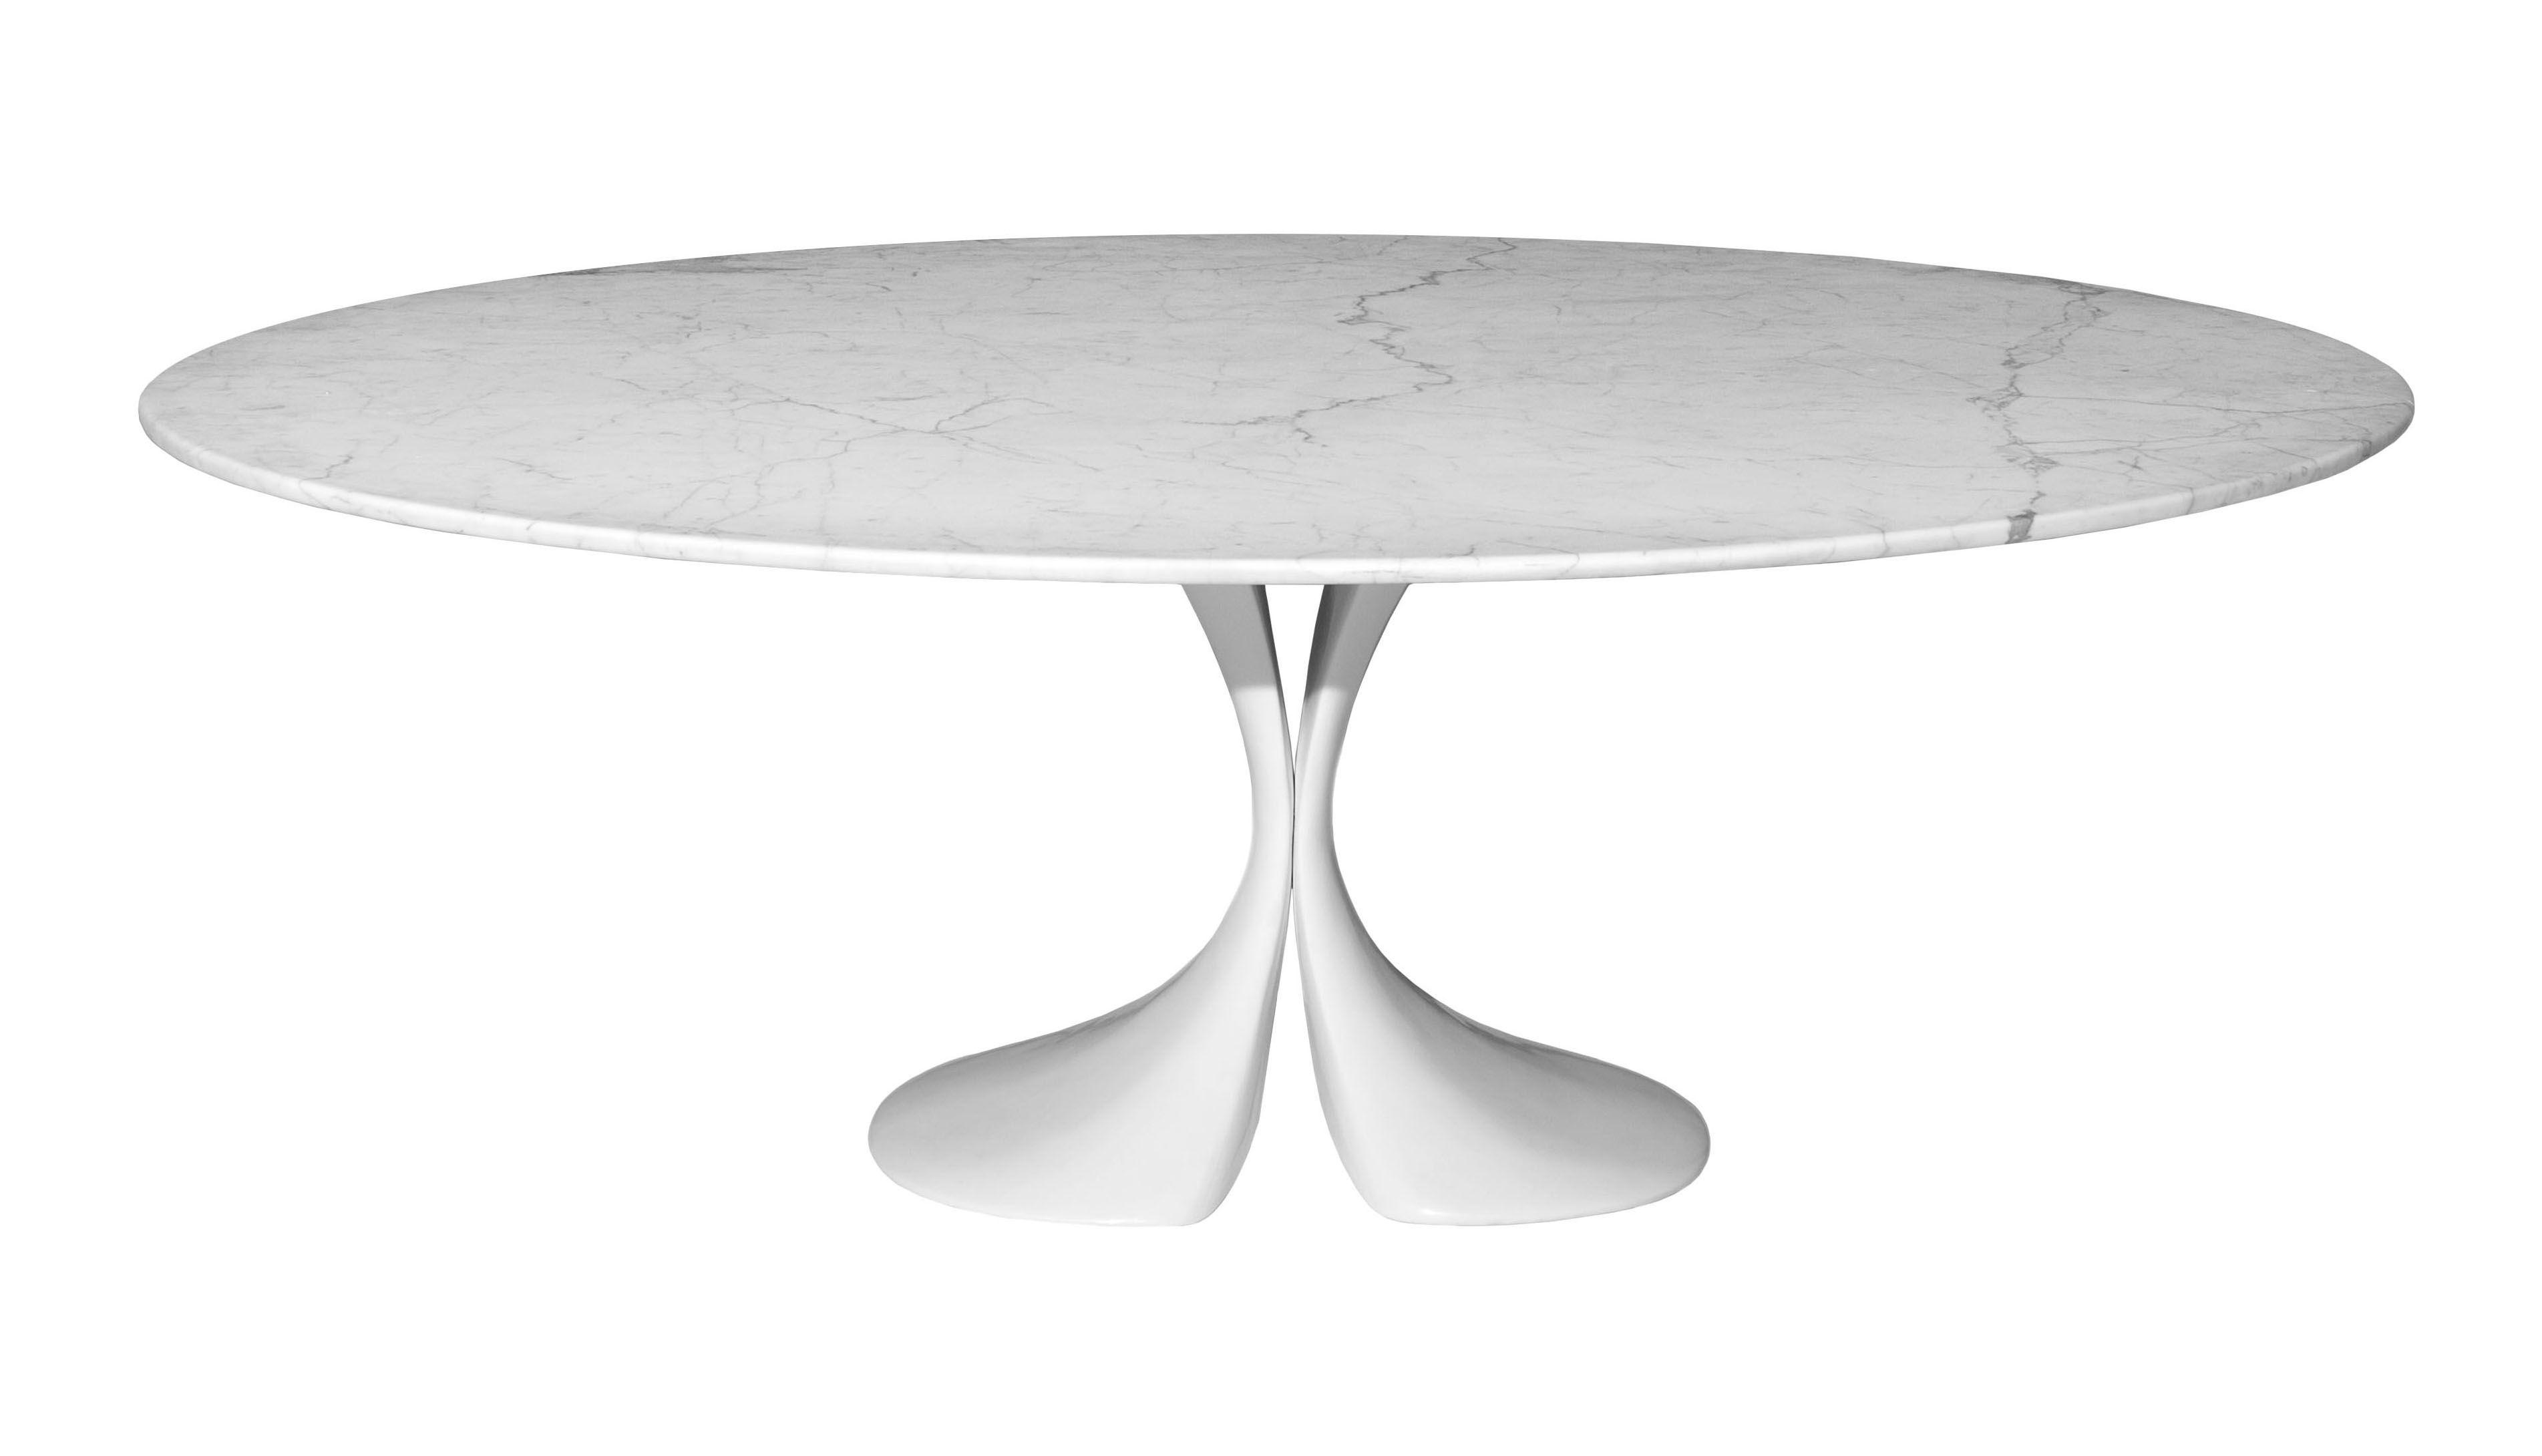 Tendances - Espace Repas - Table Didymos / Marbre - 180 x 126 cm - Driade - Plateau en marbre blanc - Cristalplant, Marbre